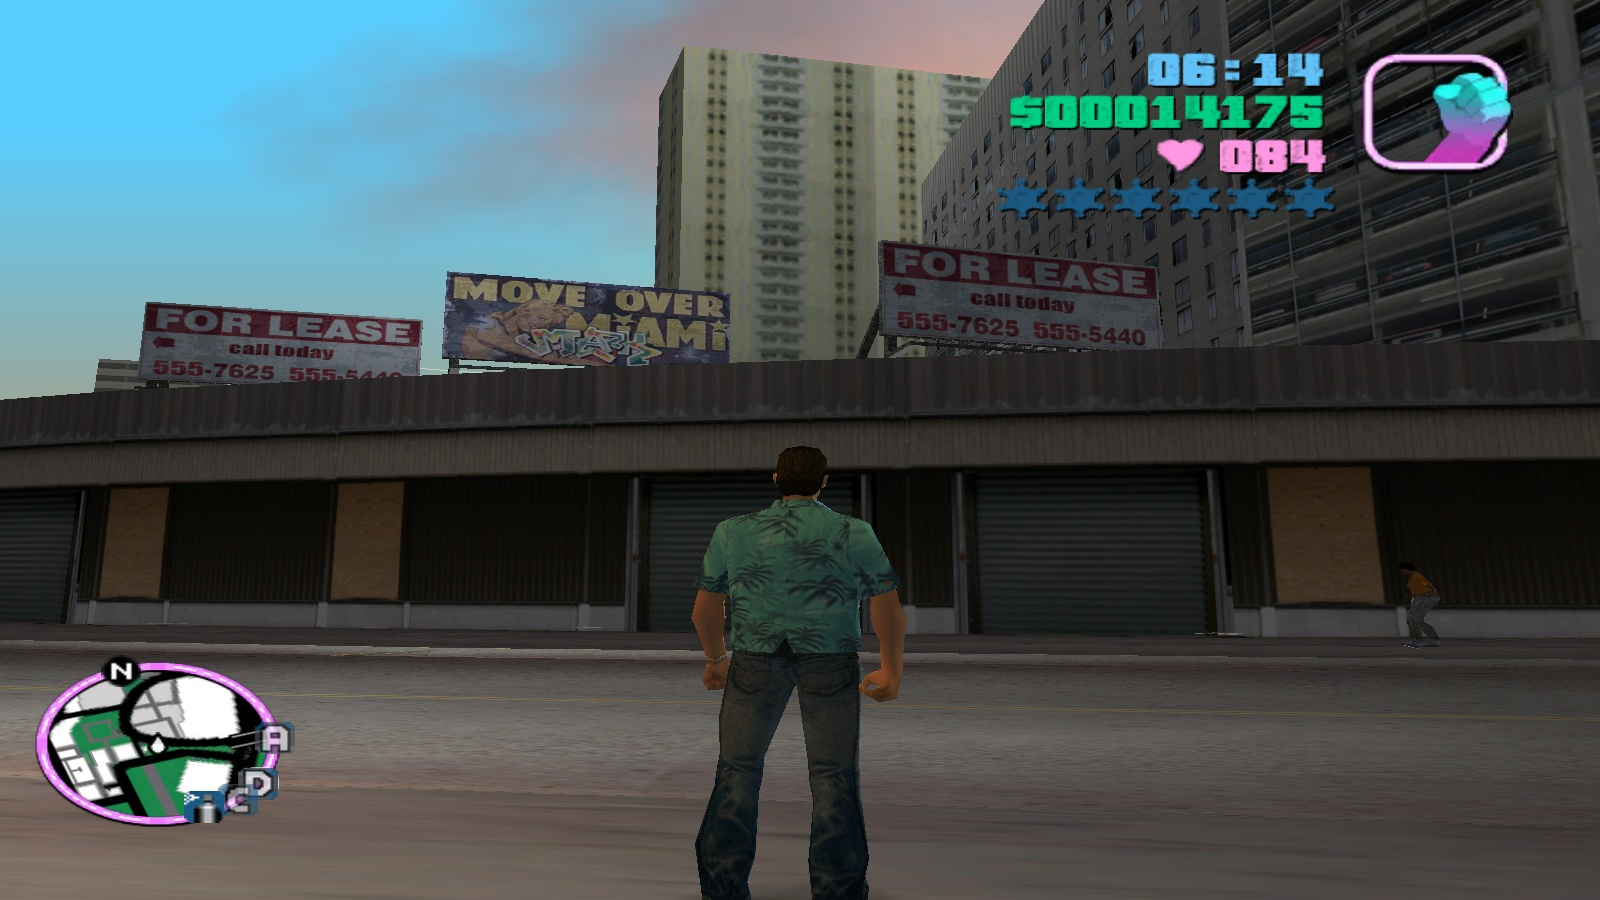 8 - Grand Theft Auto: Vice City